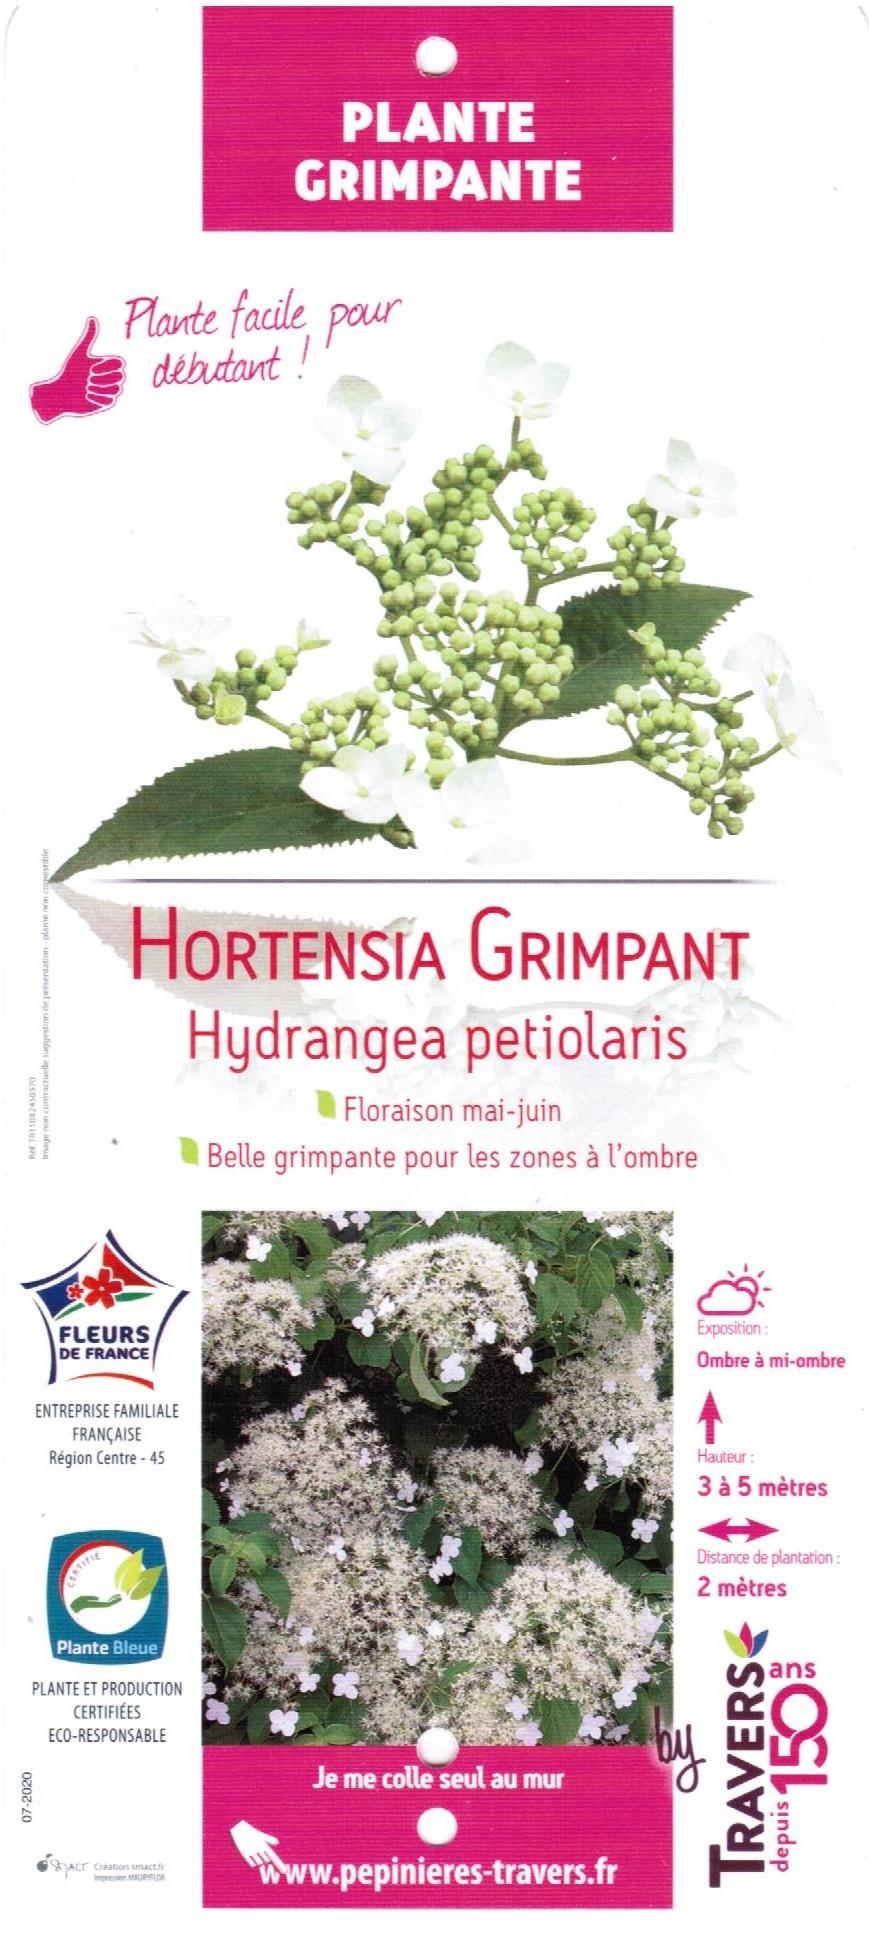 Hortensia Grimpant Hydrangea petiolaris - La Jardinerie de Pessicart 06100 Nice 001